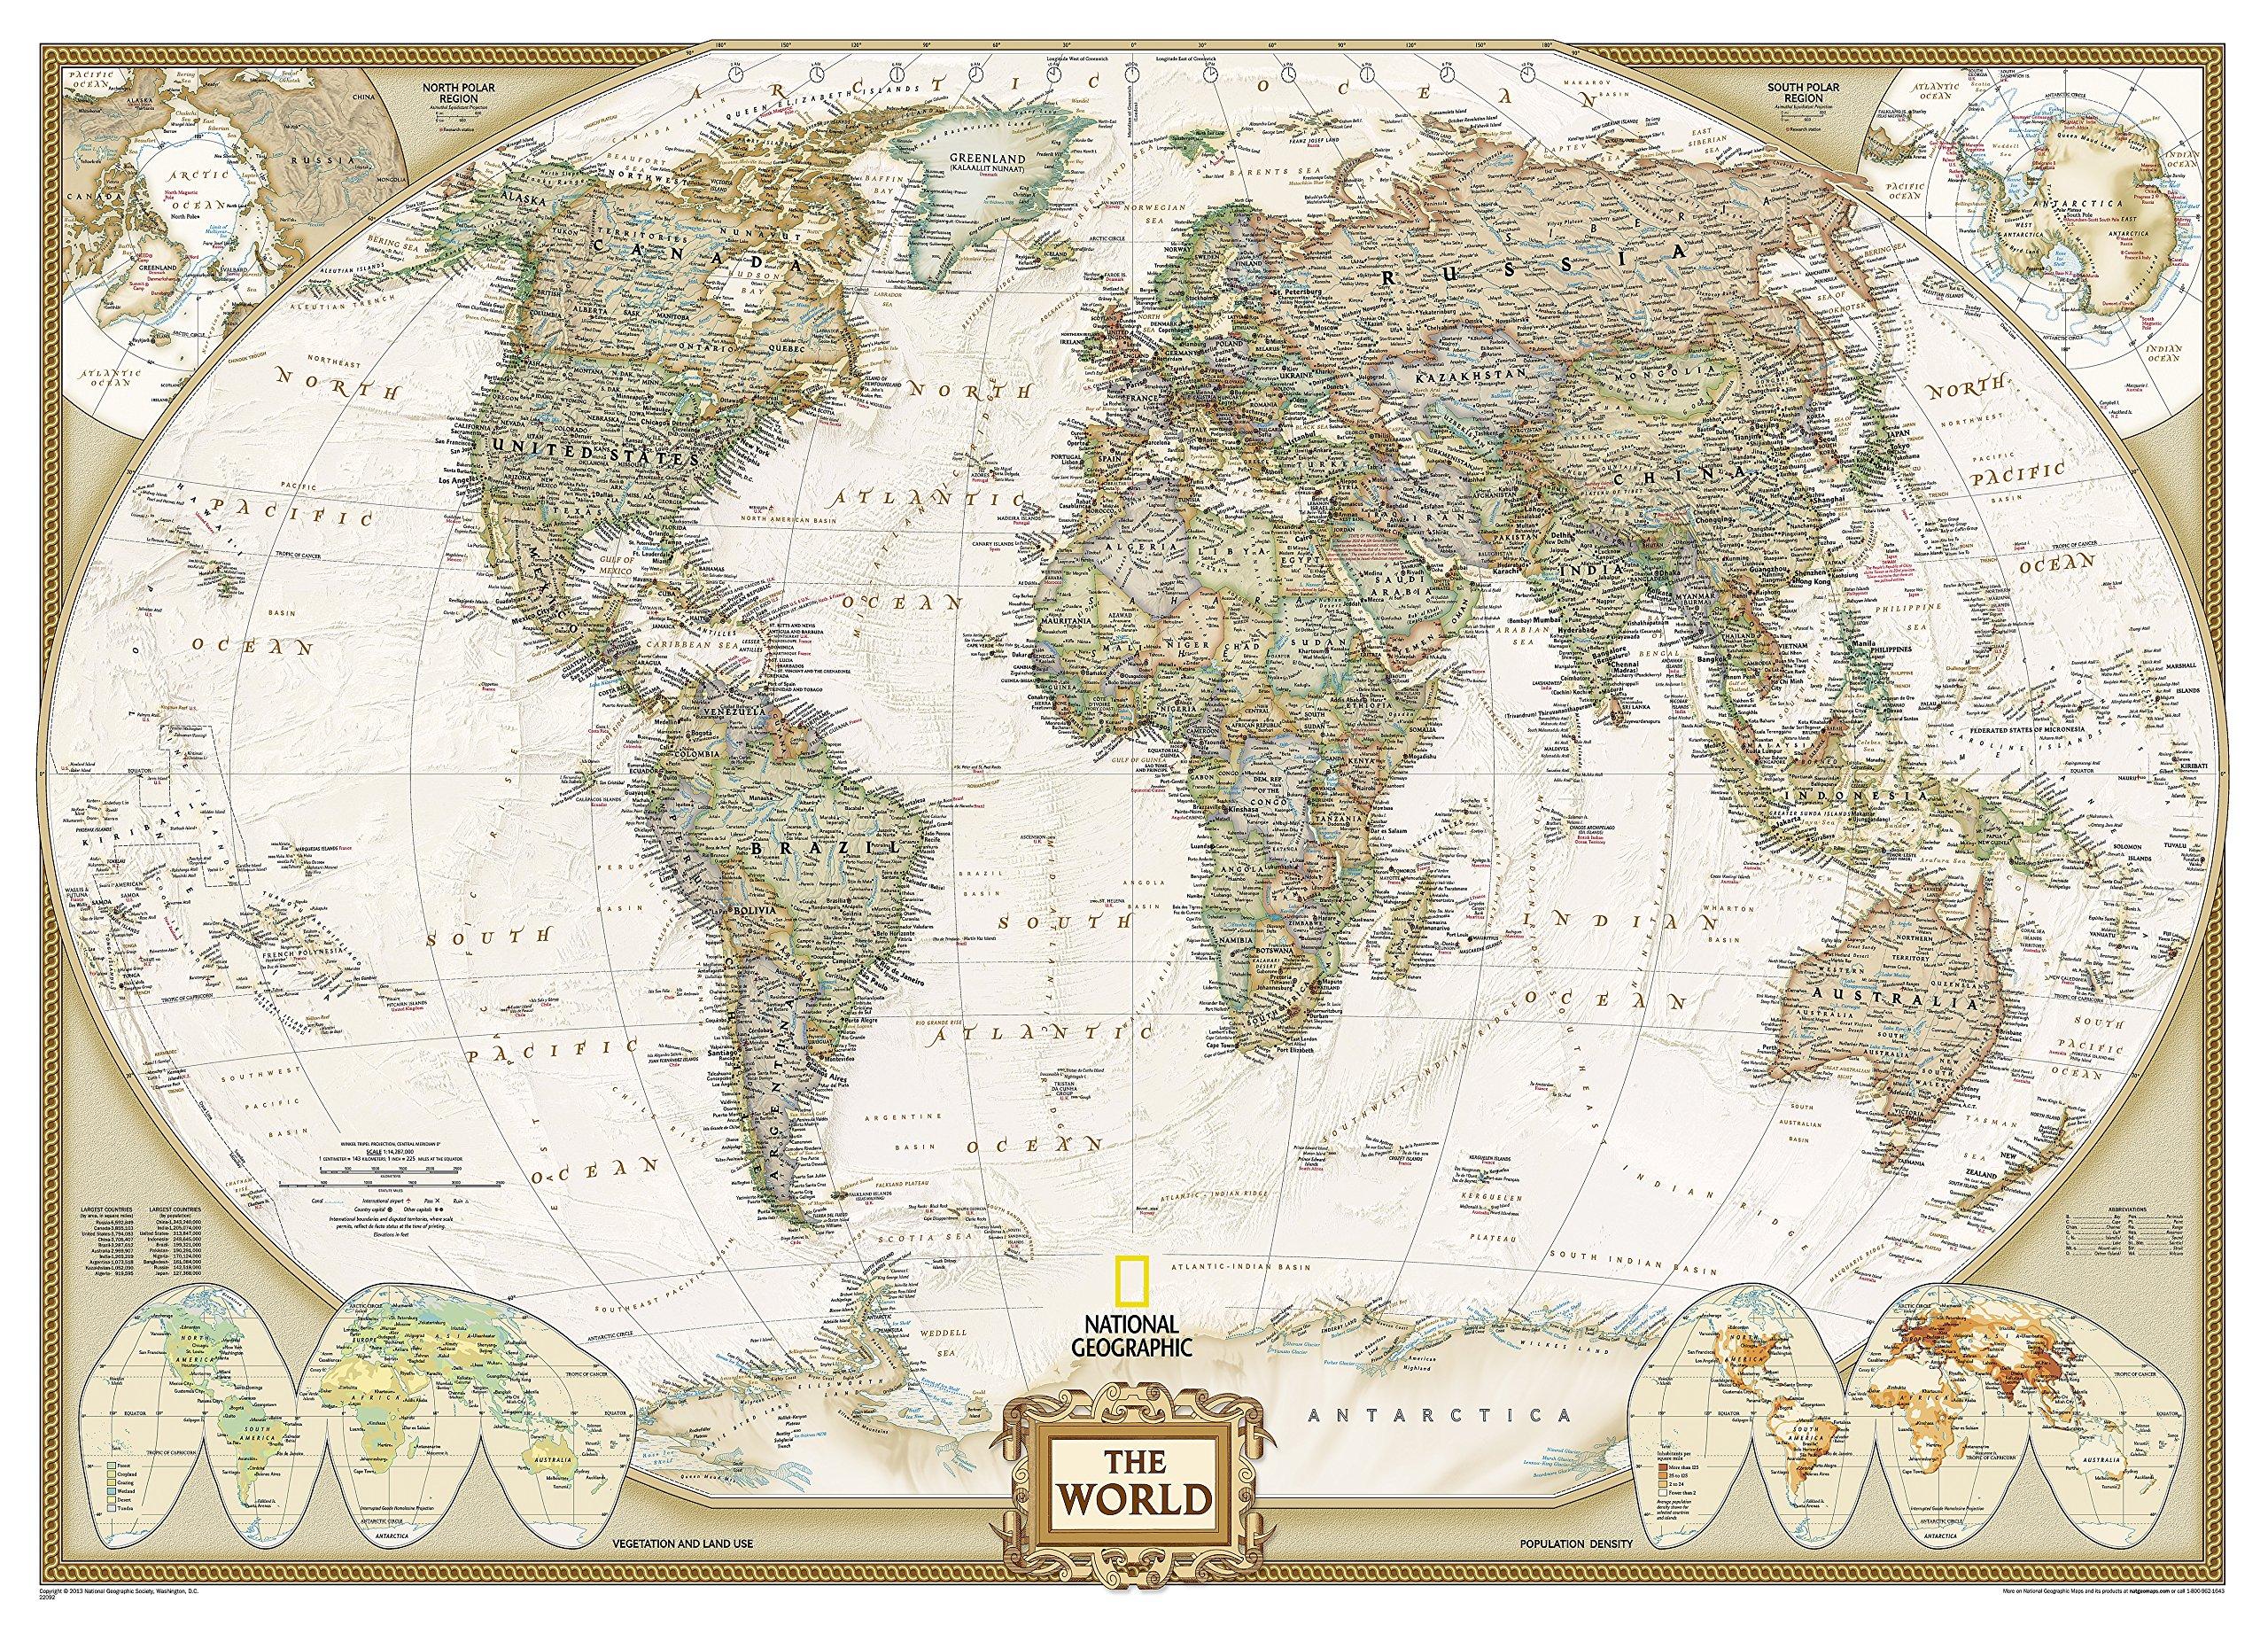 Mapa mural del mundo executive gigante 3 partes 295x193 cm. Inglés. National Geographic.: 3 Parts Reference - World: Amazon.es: VV.AA.: Libros en idiomas extranjeros